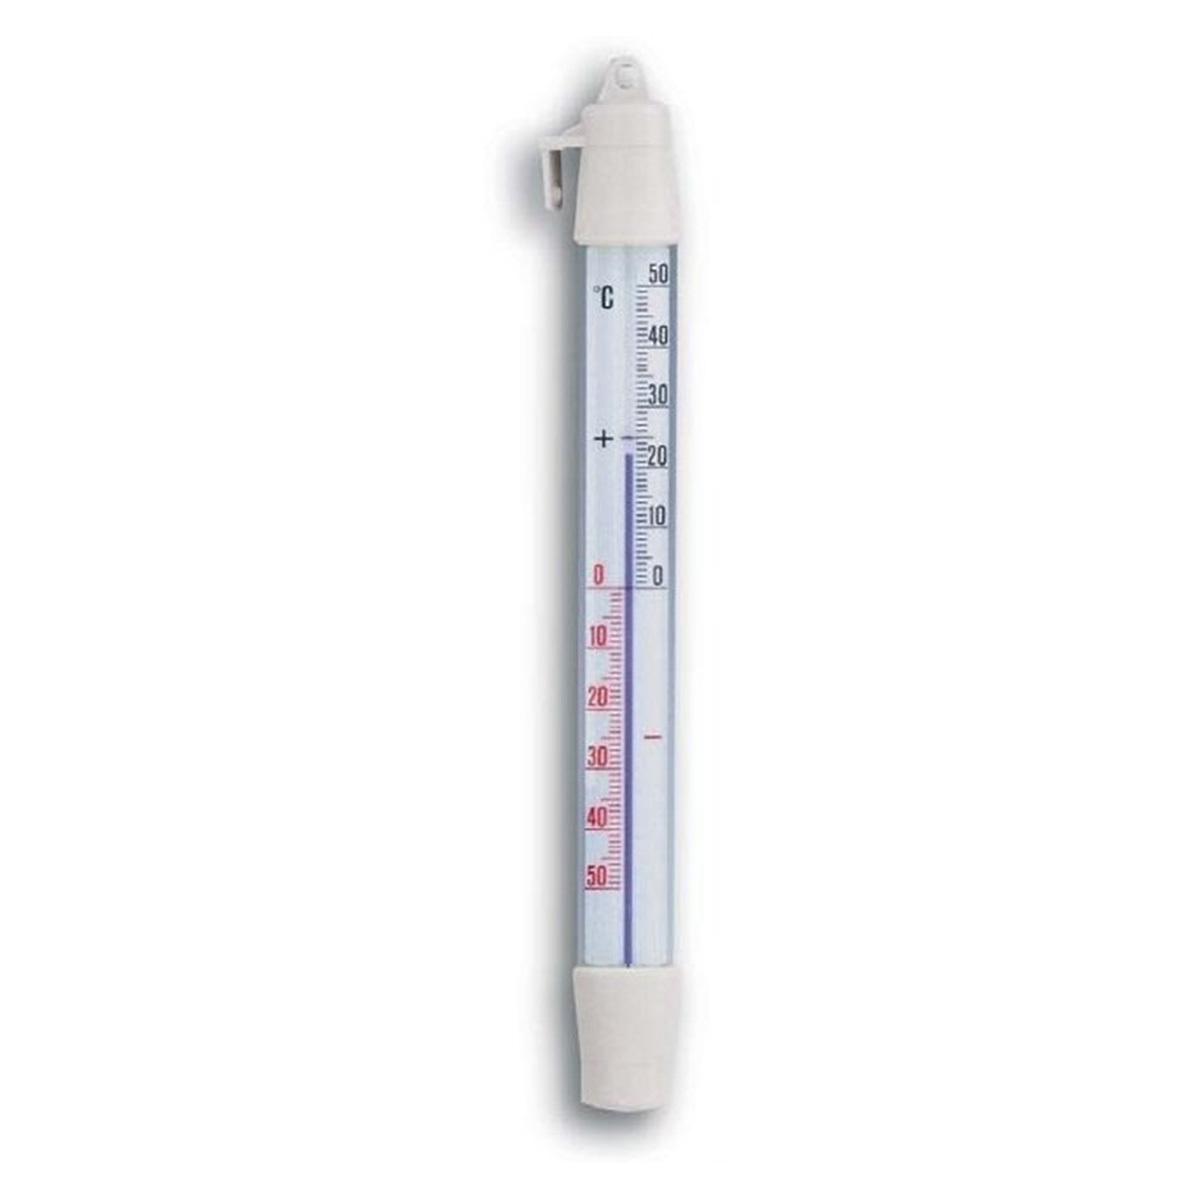 14-4003-02-98-analoges-kühlthermometer-1200x1200px.jpg